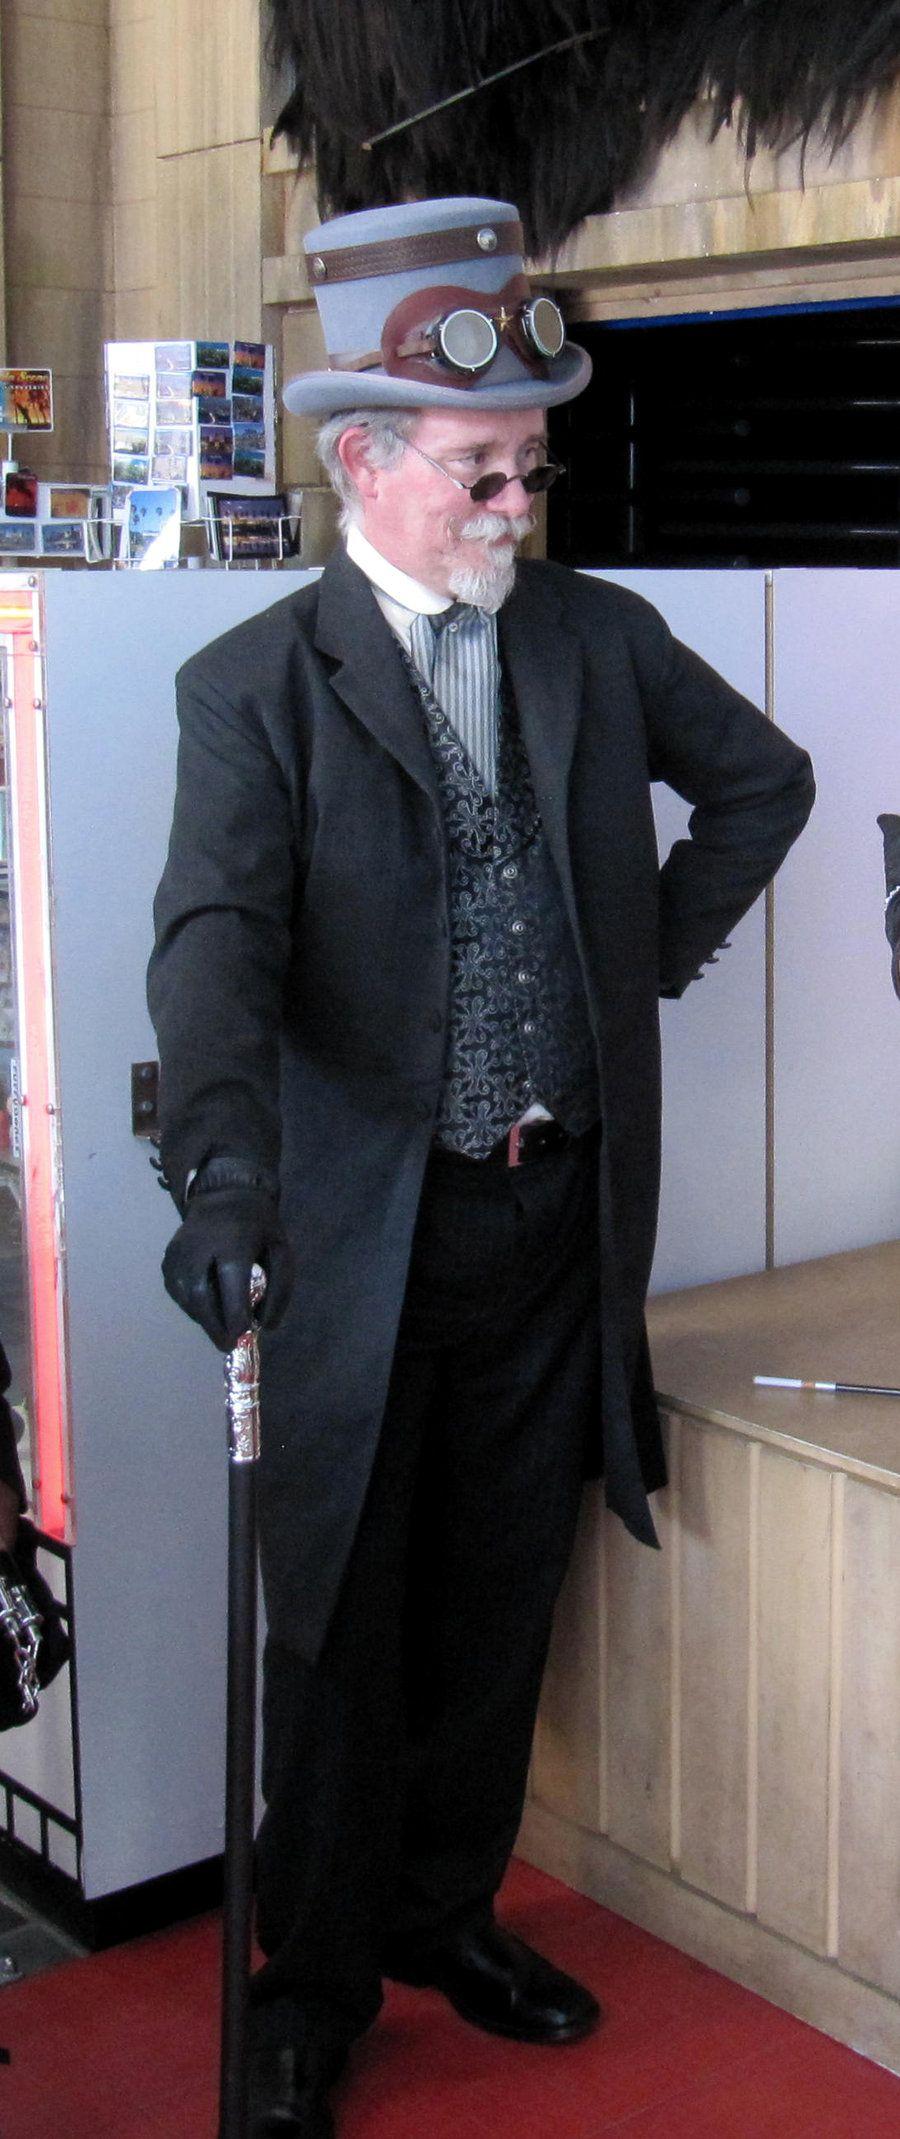 Steampunk Gentleman 2 by MJBivouac.deviantart.com on @deviantART